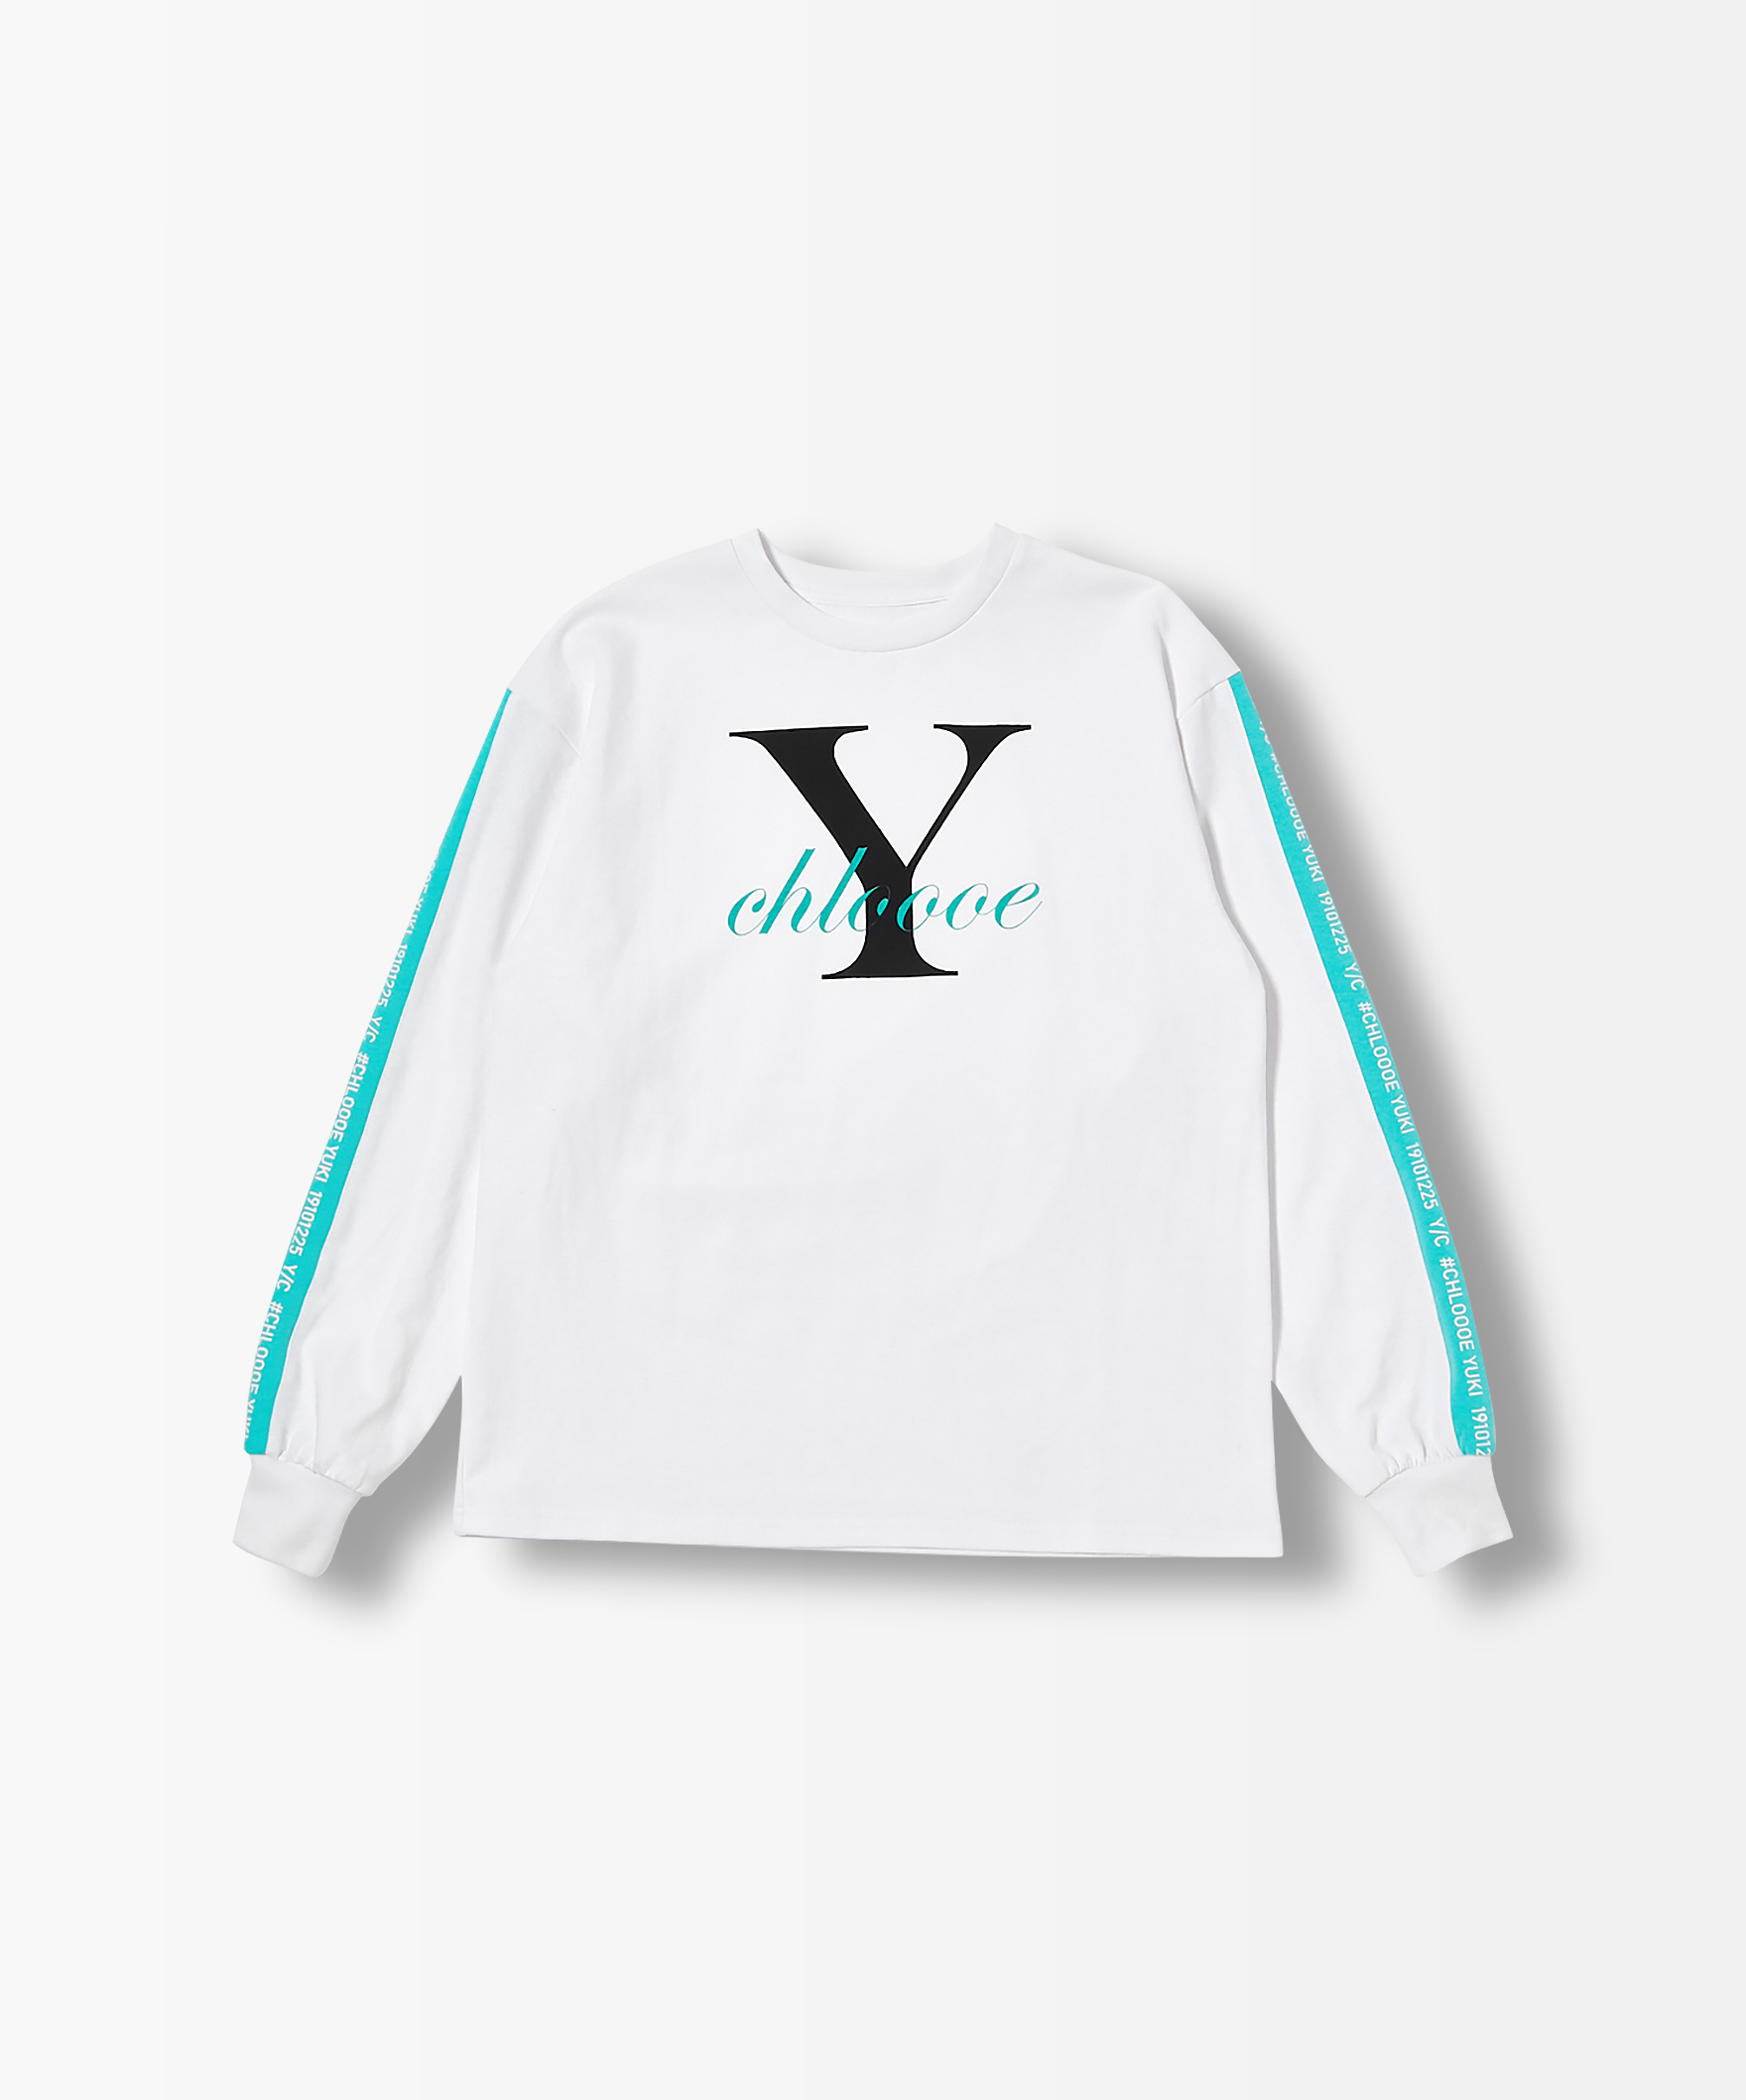 chloeYロゴロングTシャツ